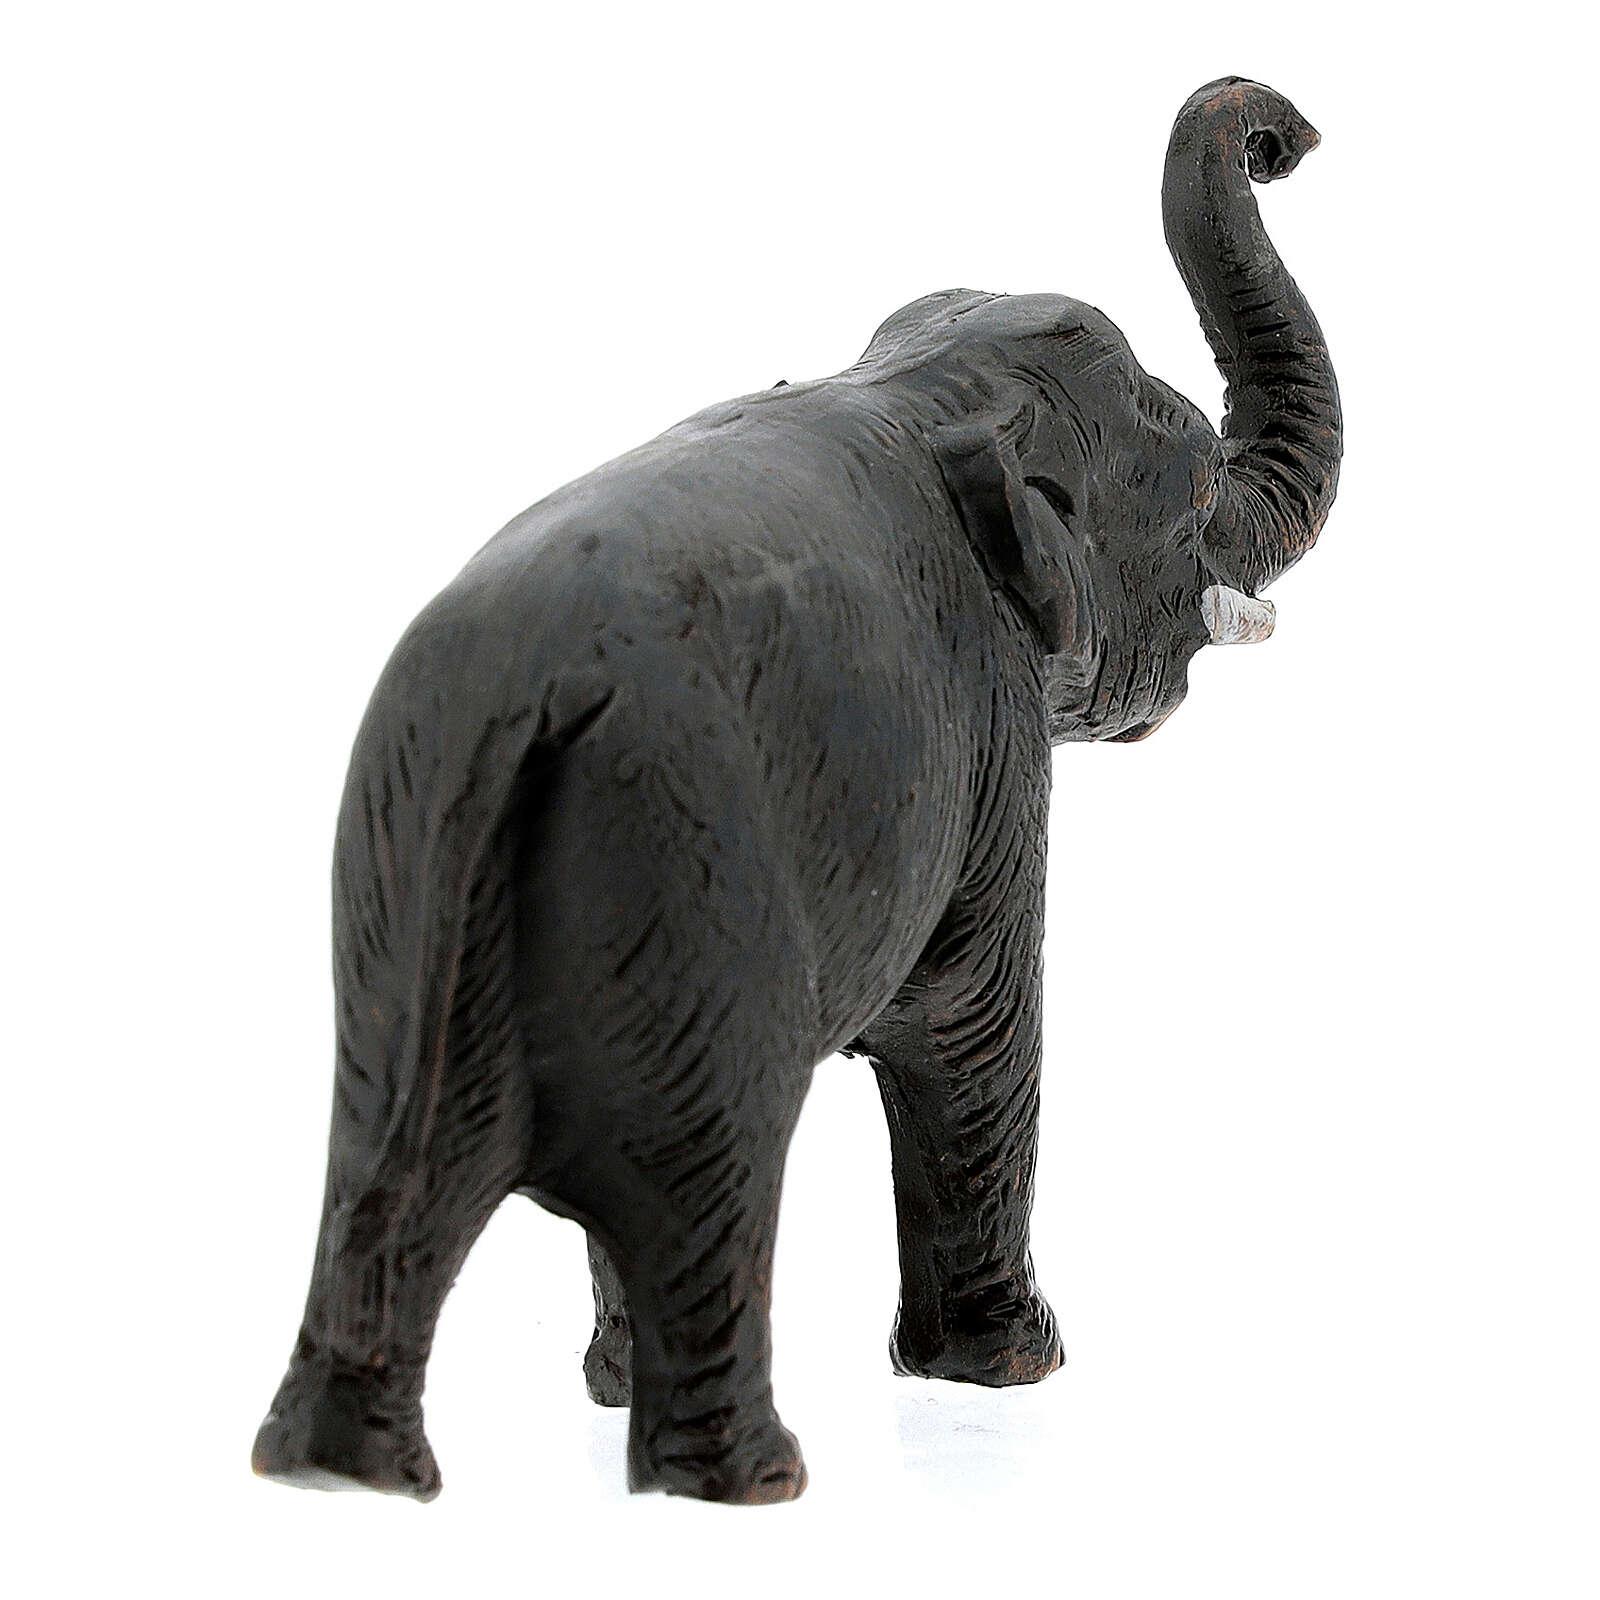 Elefante de terracota belén napolitano 4 cm 4